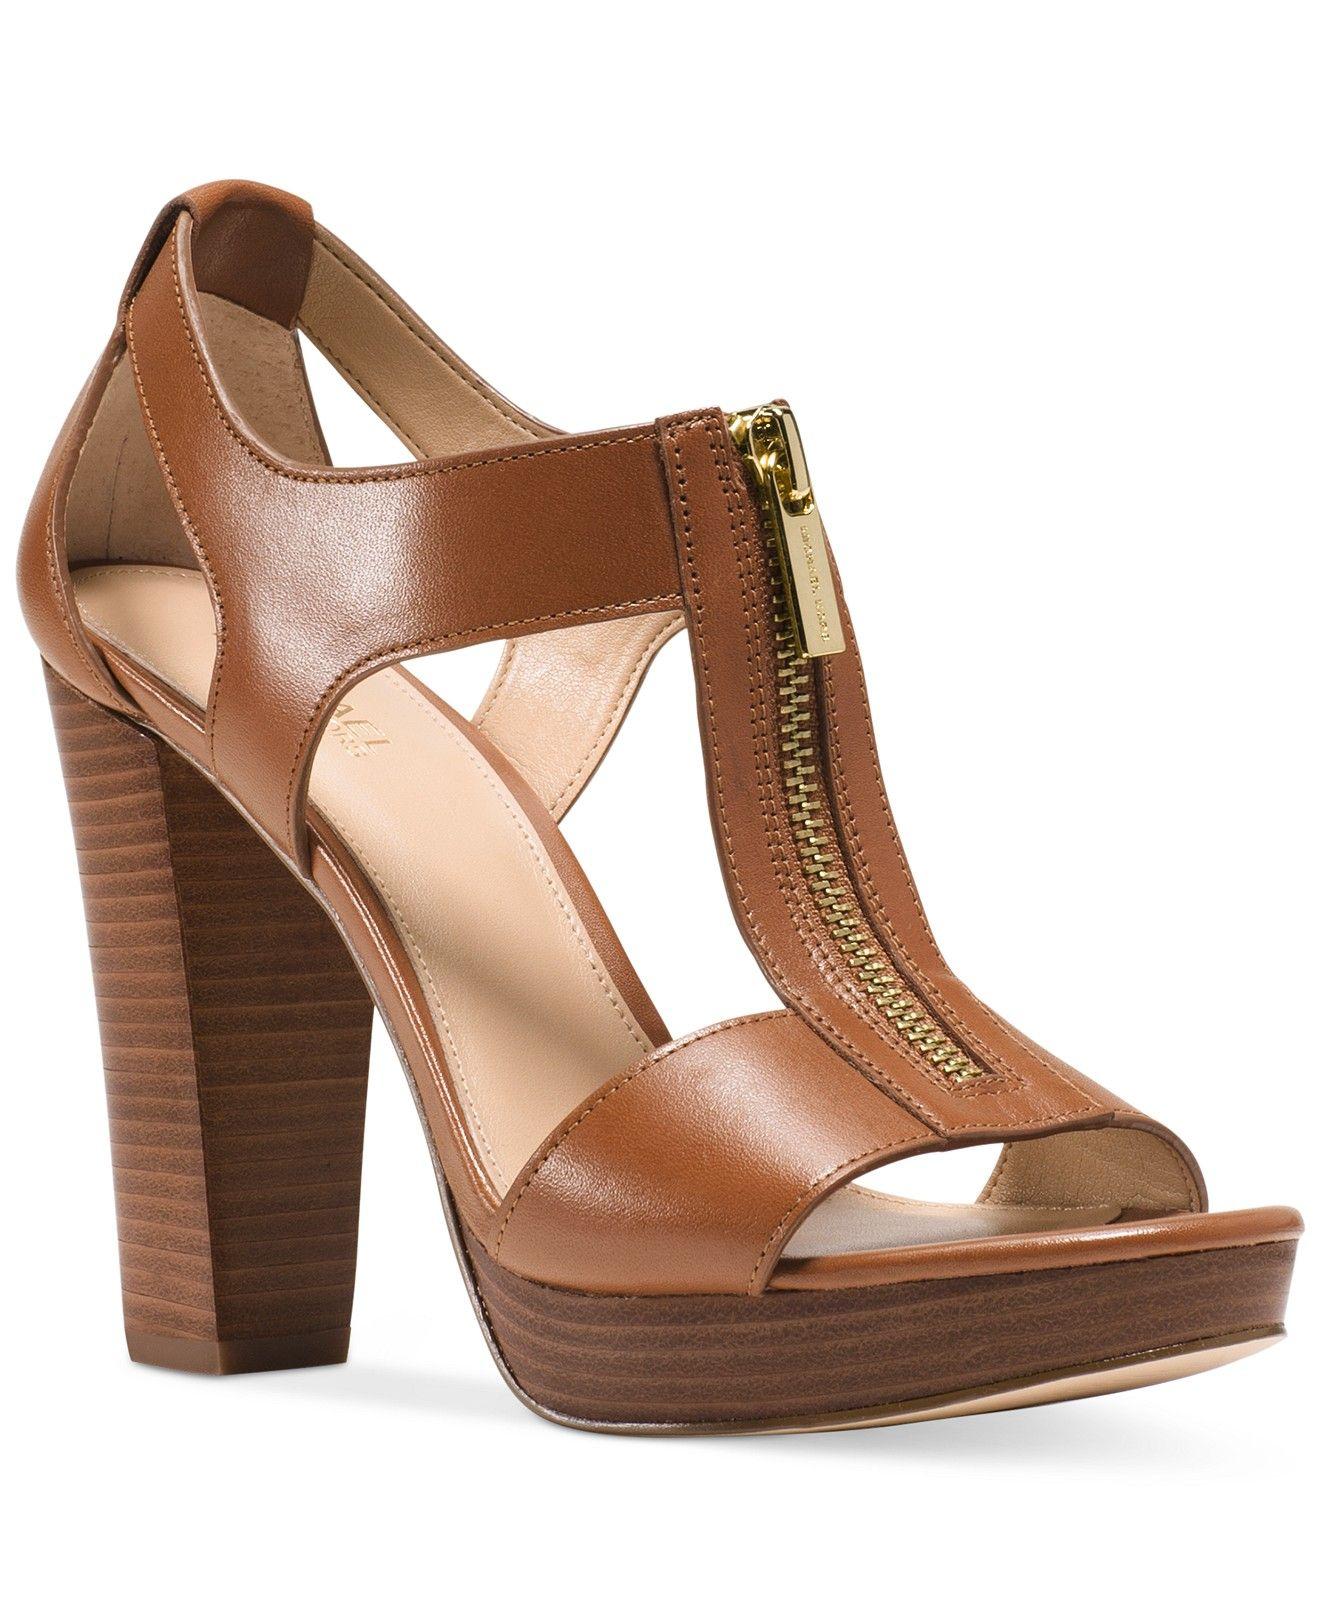 f19483a9ad65 MICHAEL Michael Kors Berkley T-Strap Platform Dress Sandals - Sandals -  Shoes - Macy s